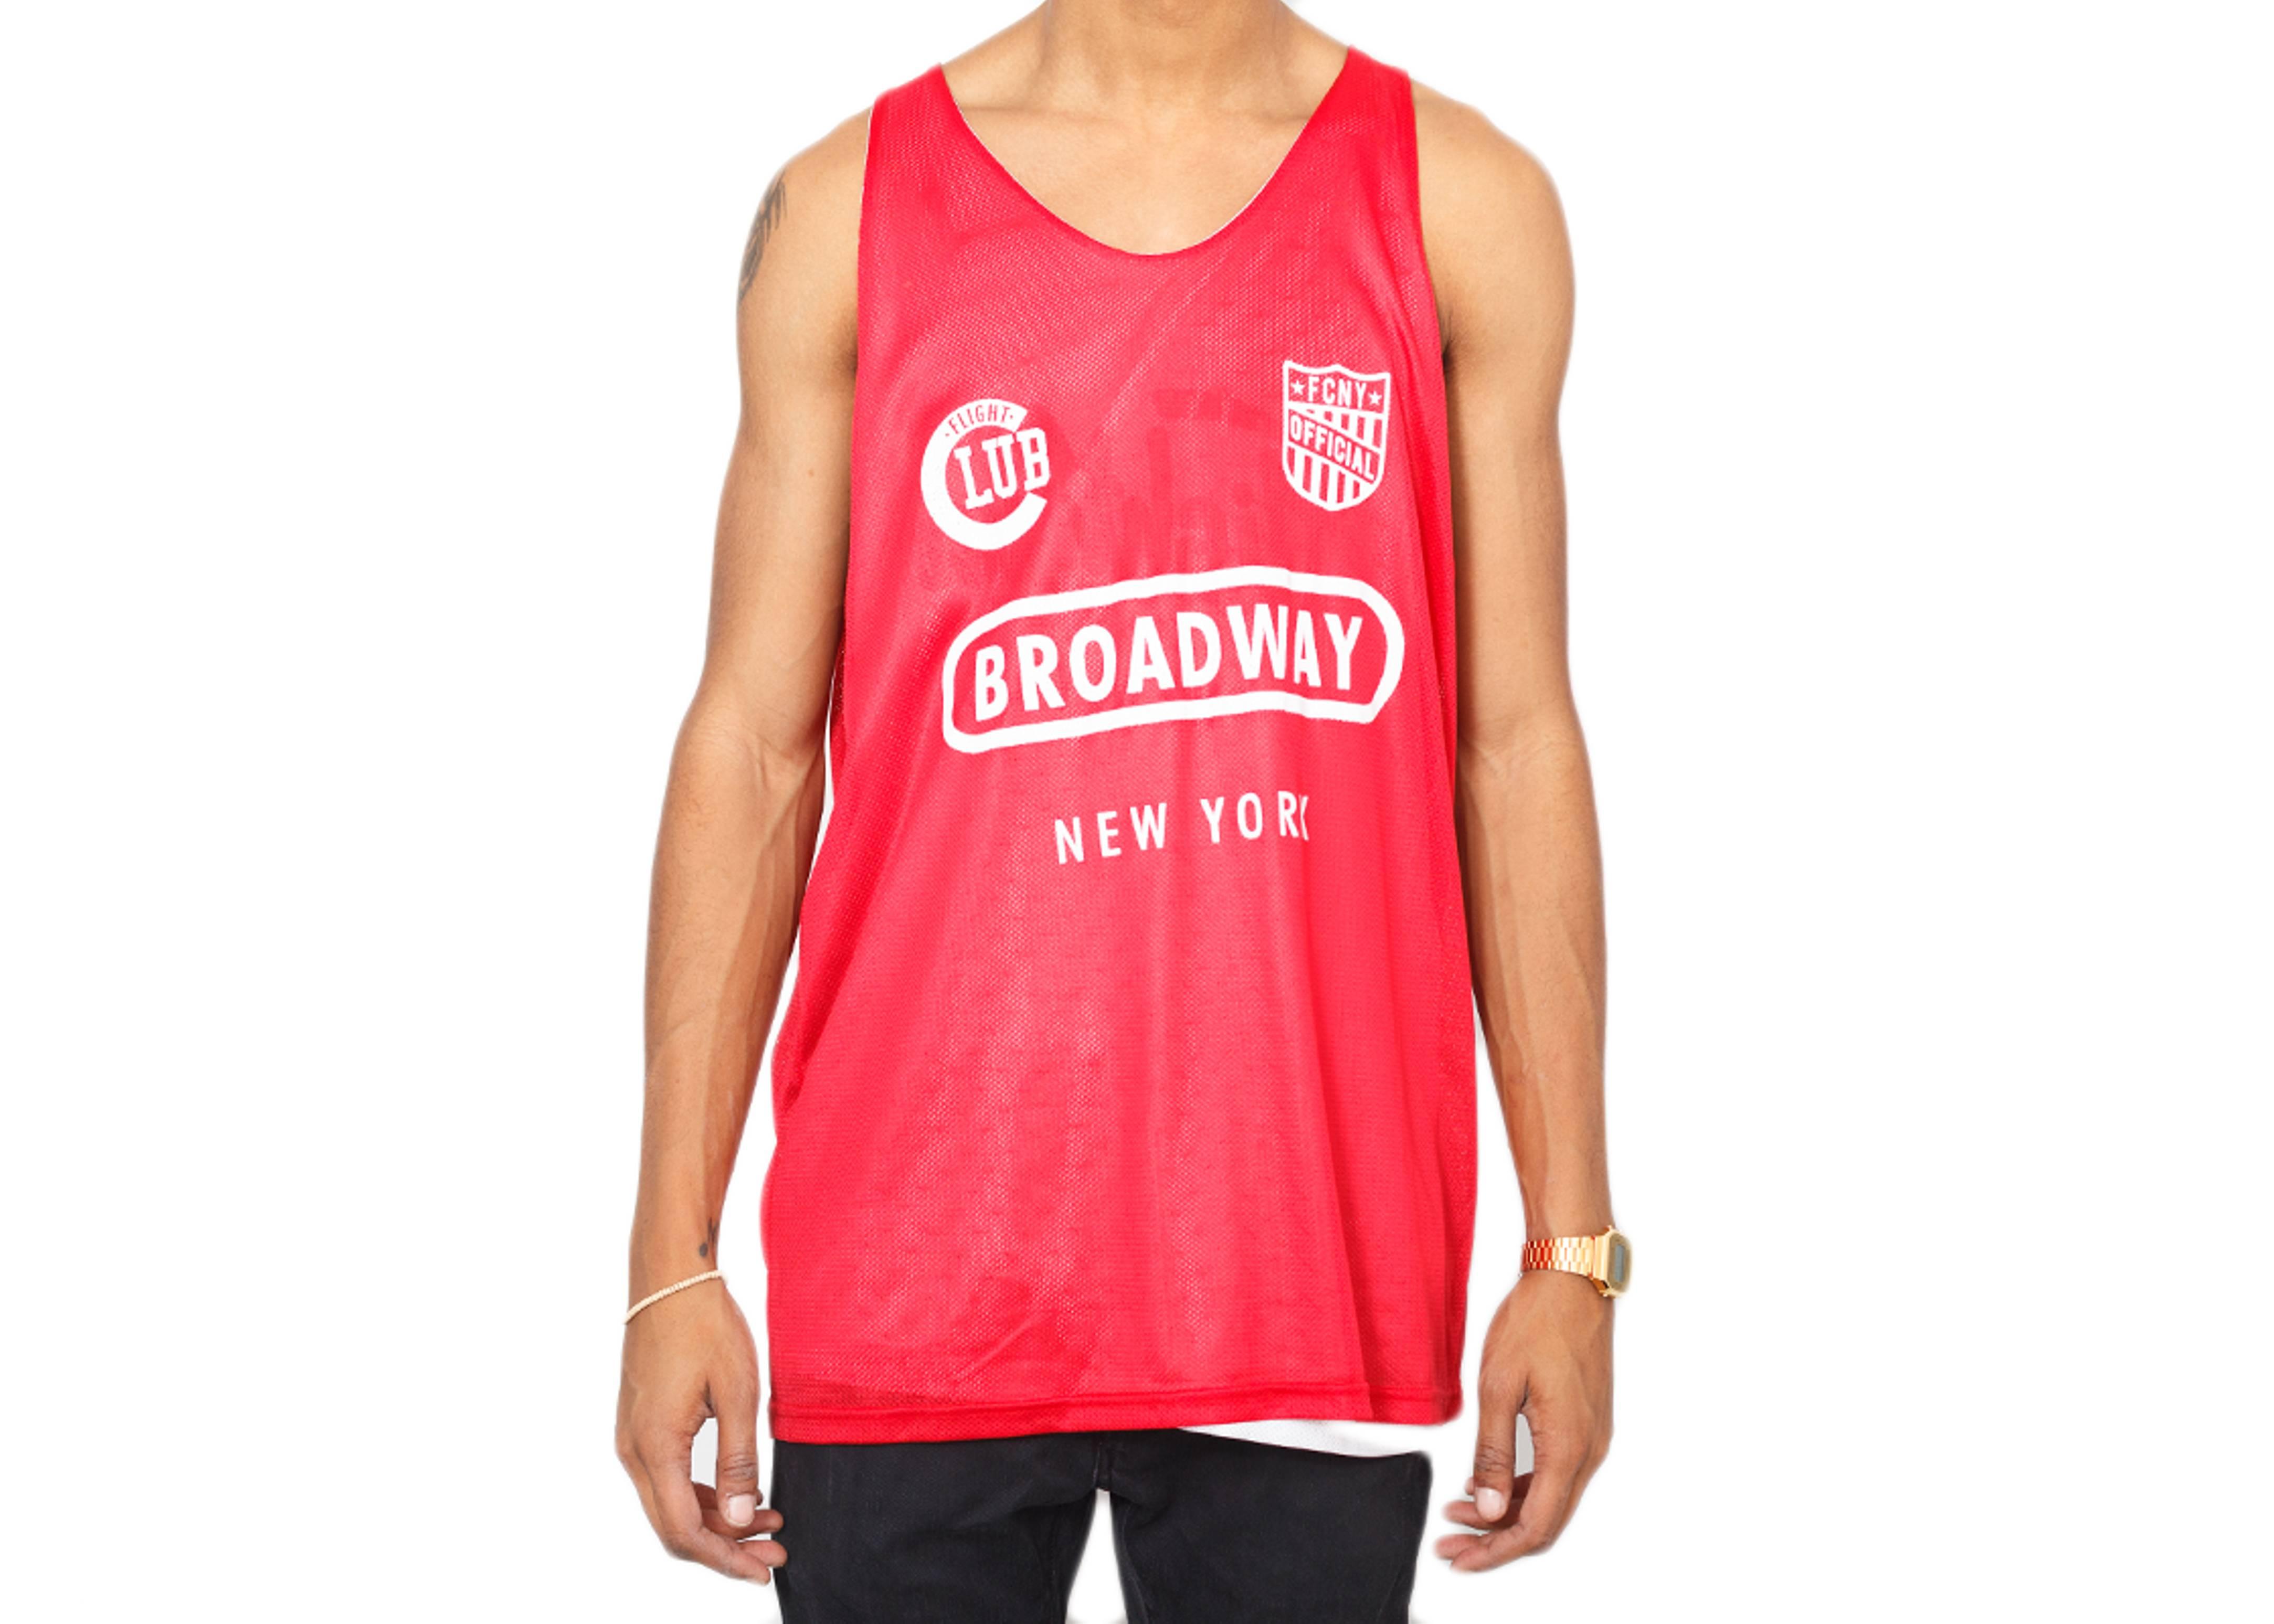 fcny broadway reversible jersey